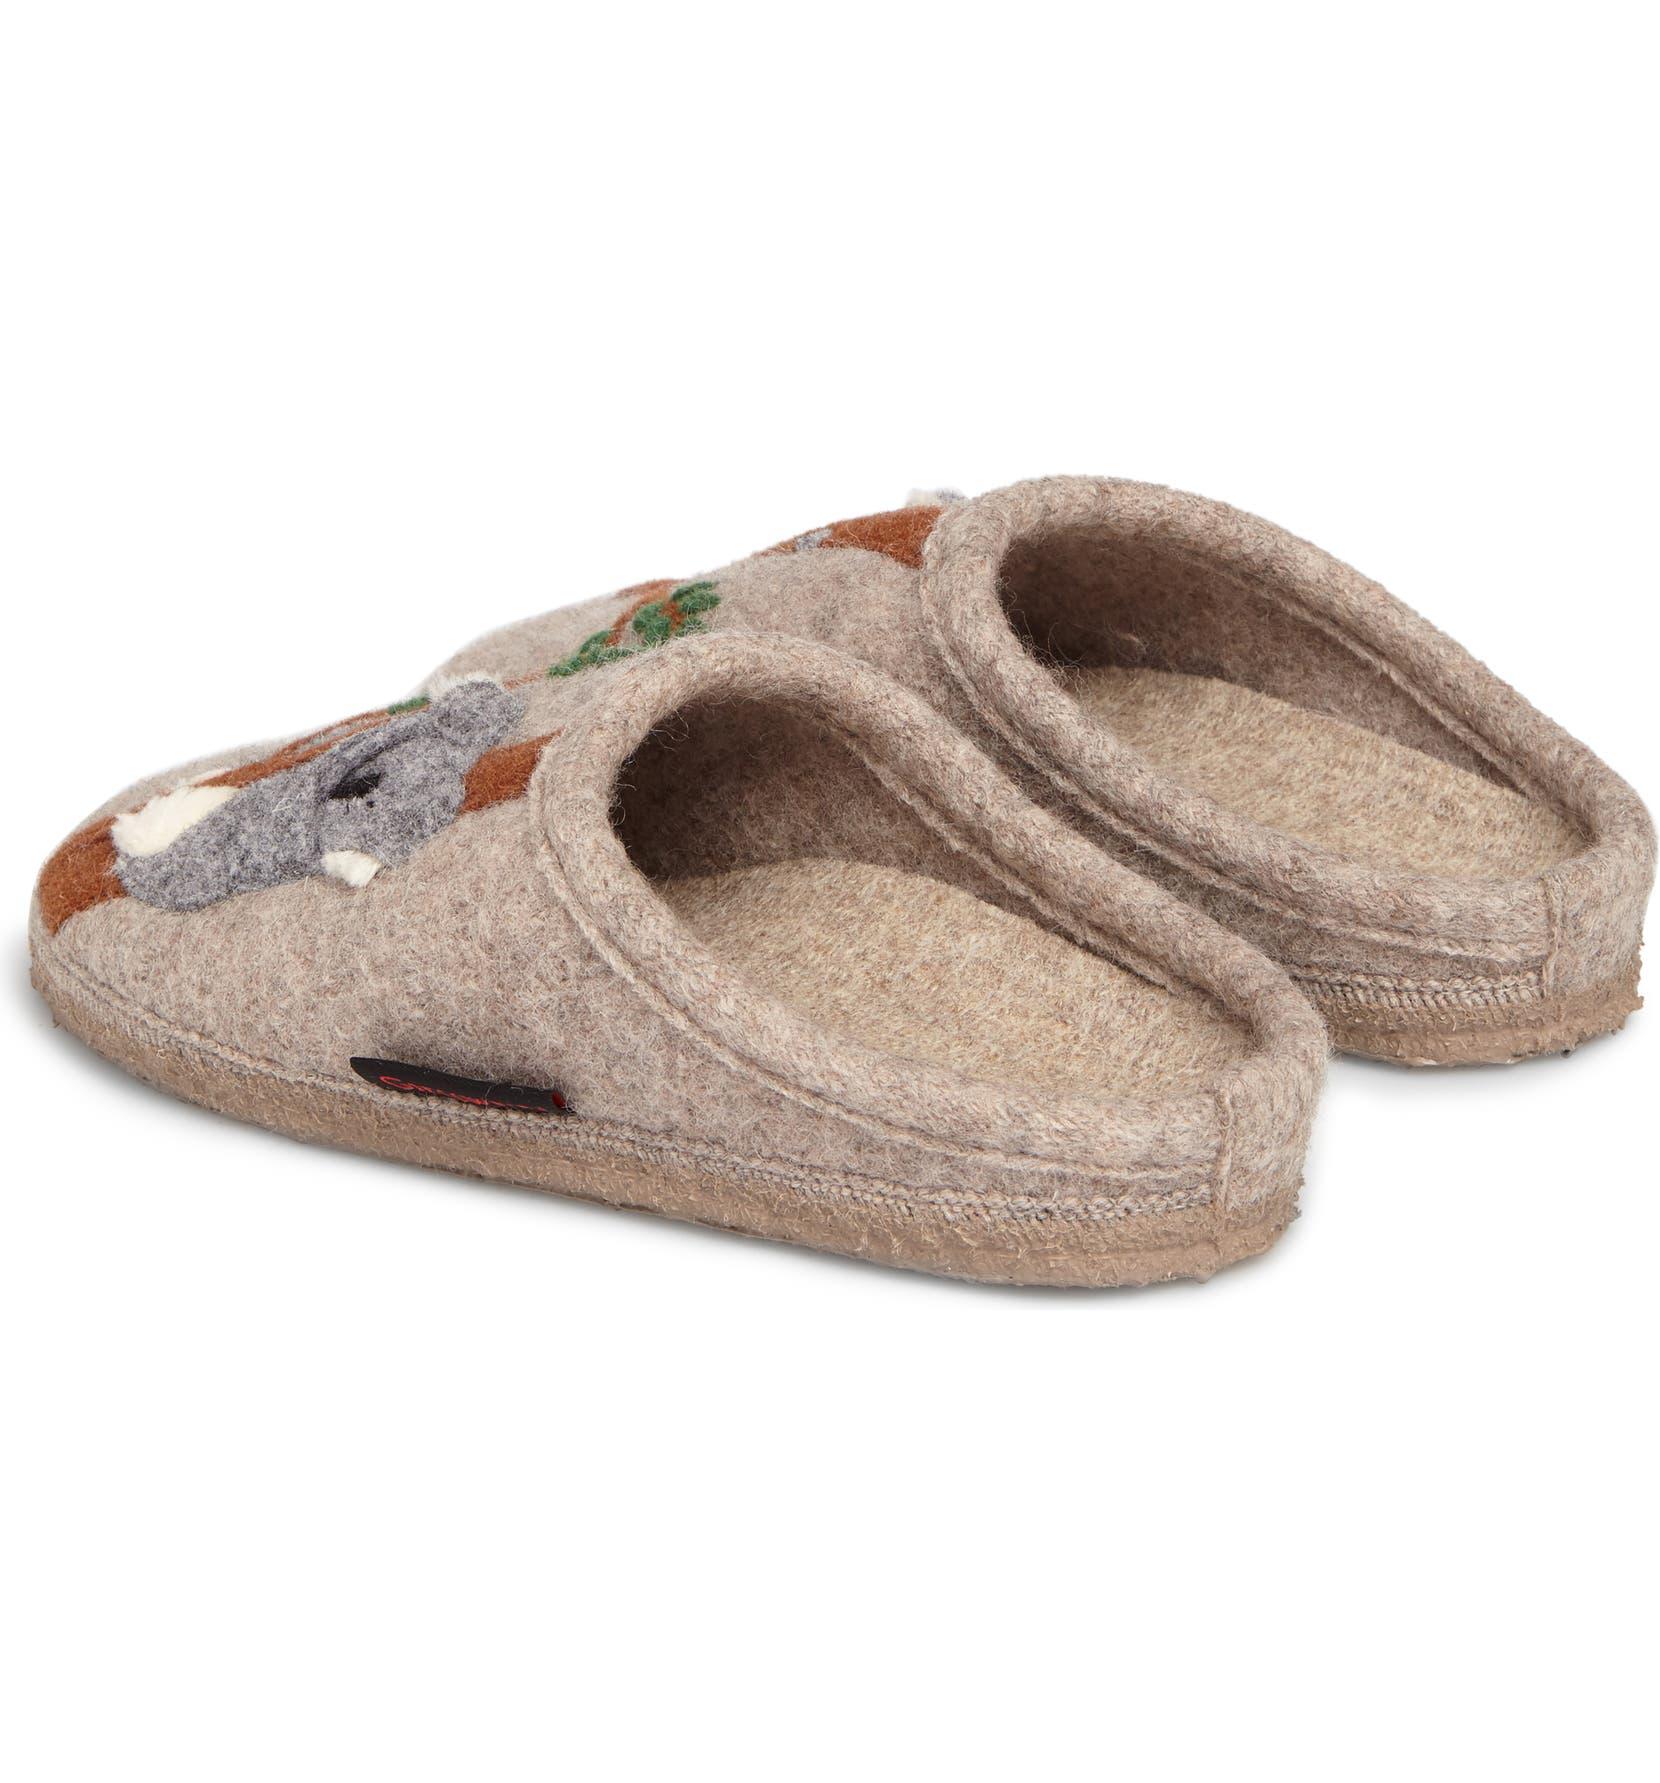 51cab78761ce Giesswein Koala Indoor Boiled Wool Slipper (Women)